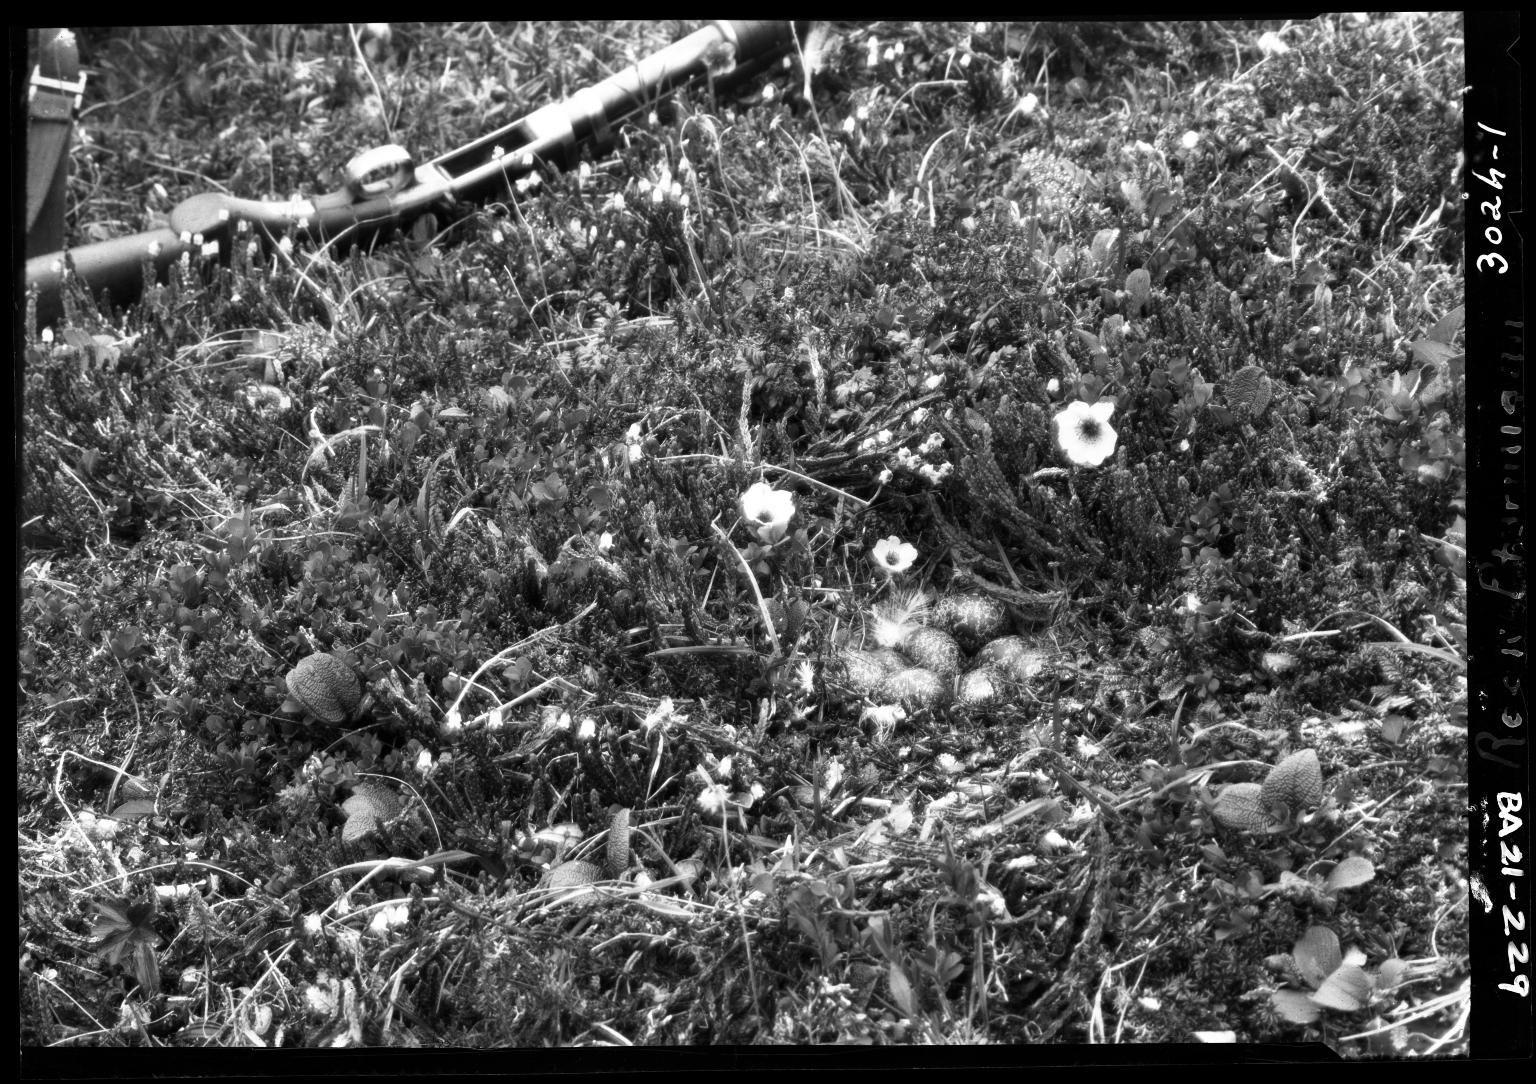 Rock Ptarmigan eggs and nest